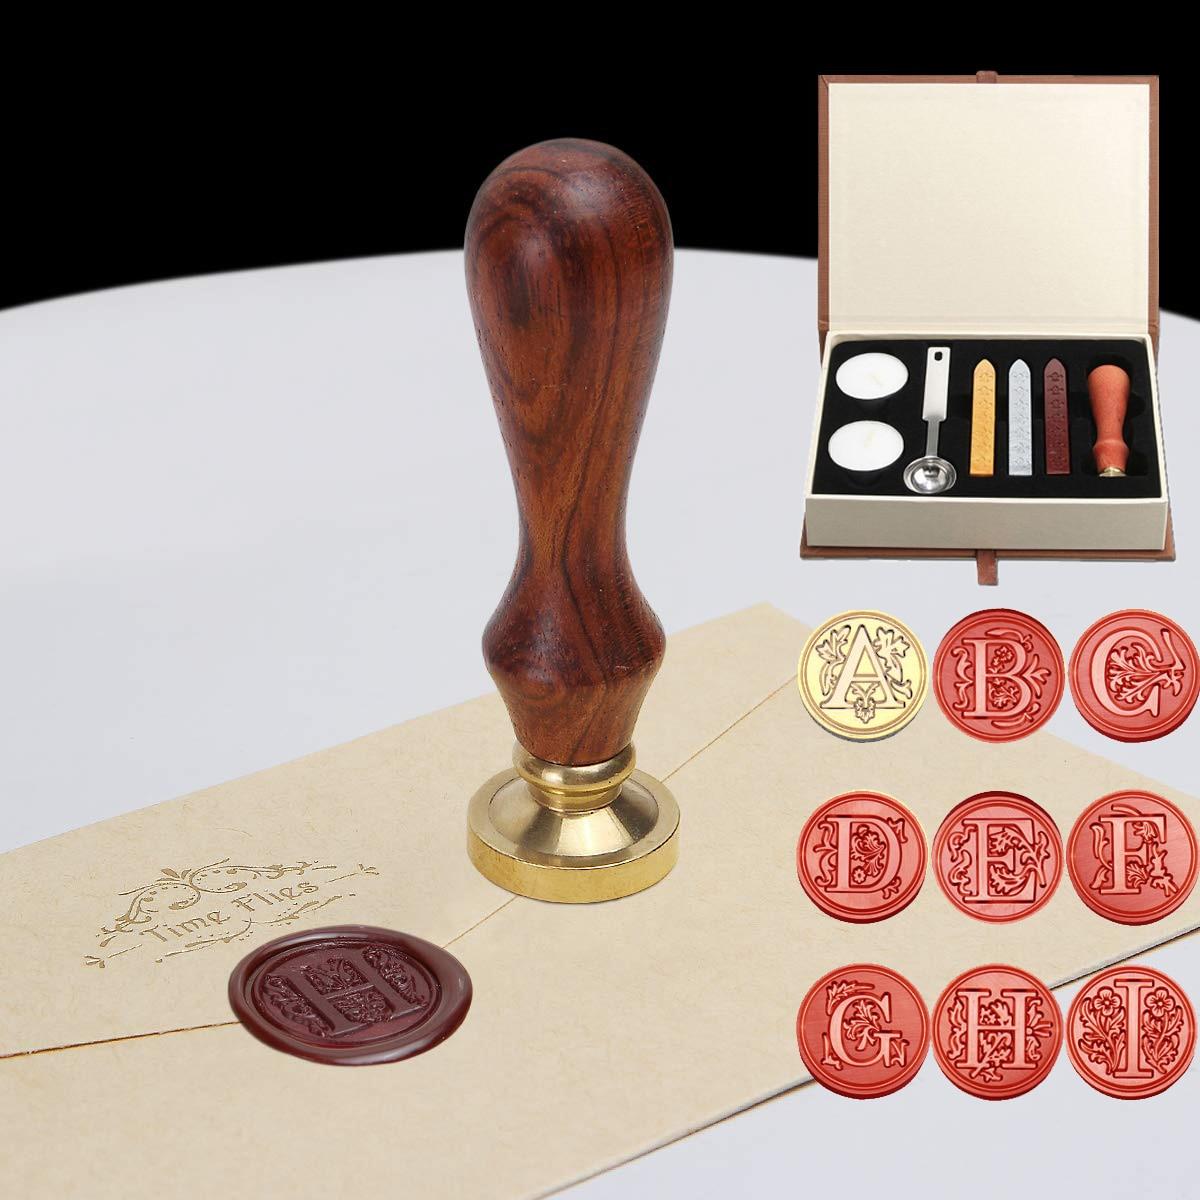 26 Letter Pattern Retro Sealing Wax Set DIY Paper Envelope Decoration Delicate Cuprum Stamps Wood Handle For Wedding Invitation